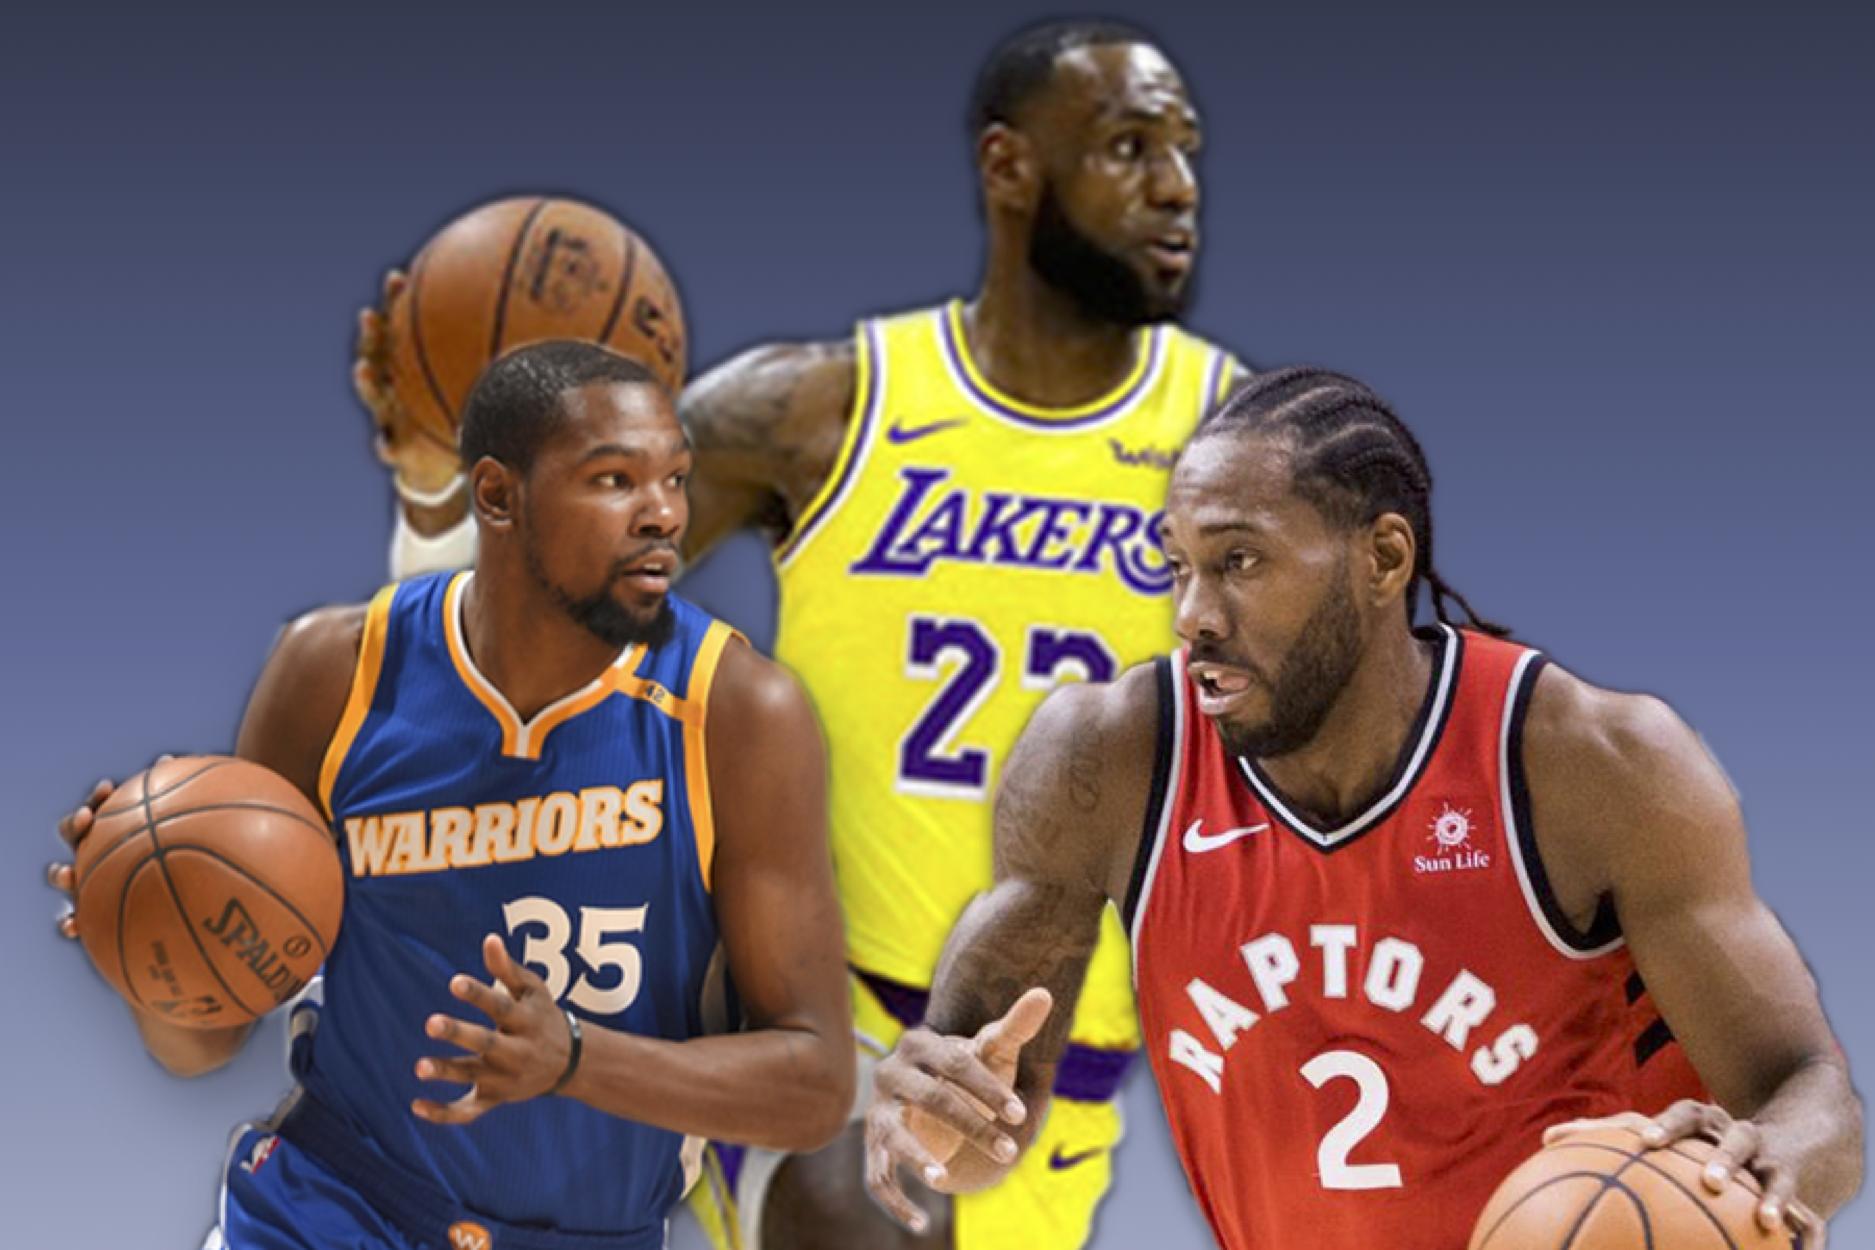 NBA returns after busy offseason